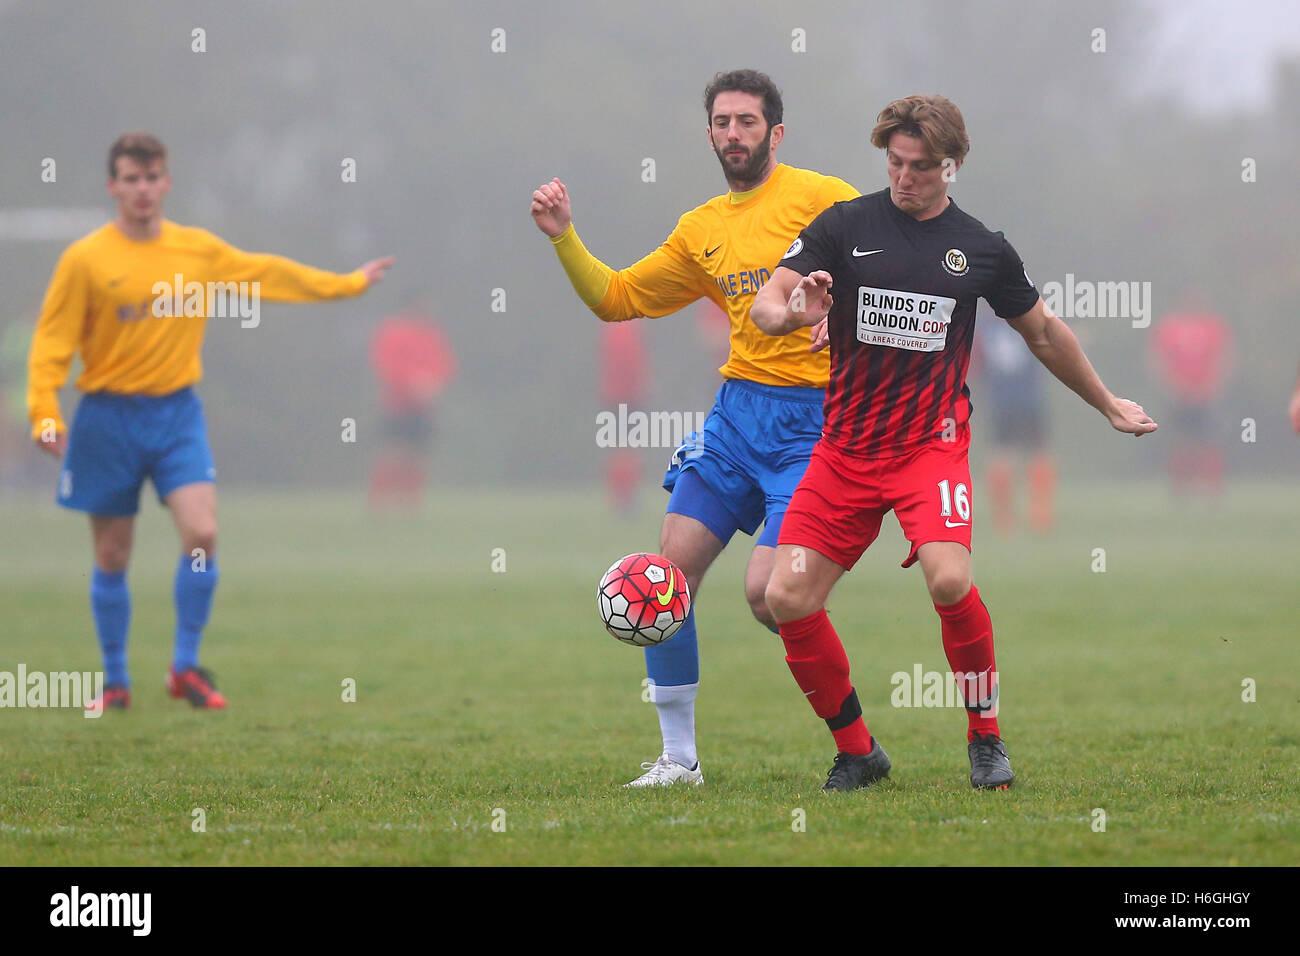 Mile End (yellow) vs Mustard, Hackney & Leyton Sunday League Football at Hackney Marshes on 30th October 2016 - Stock Image